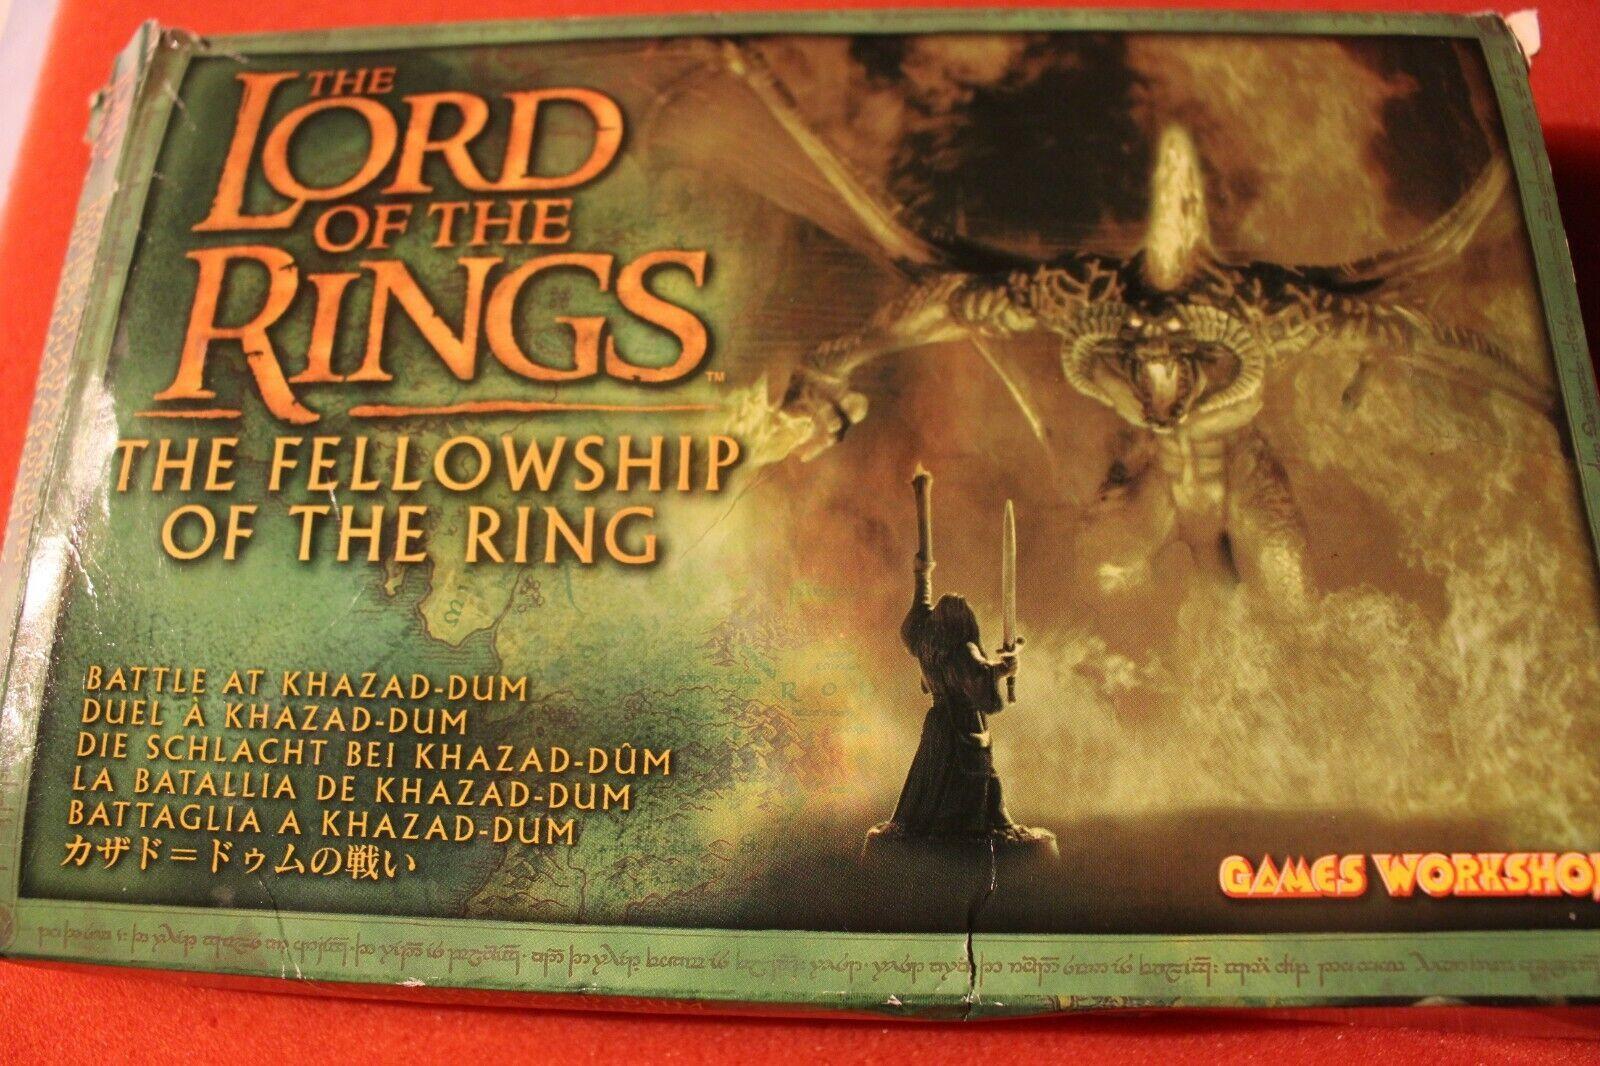 Games Workshop Lord of the Rings battle at Khazad Dum Balrog coffret Metal neuf Épuisé